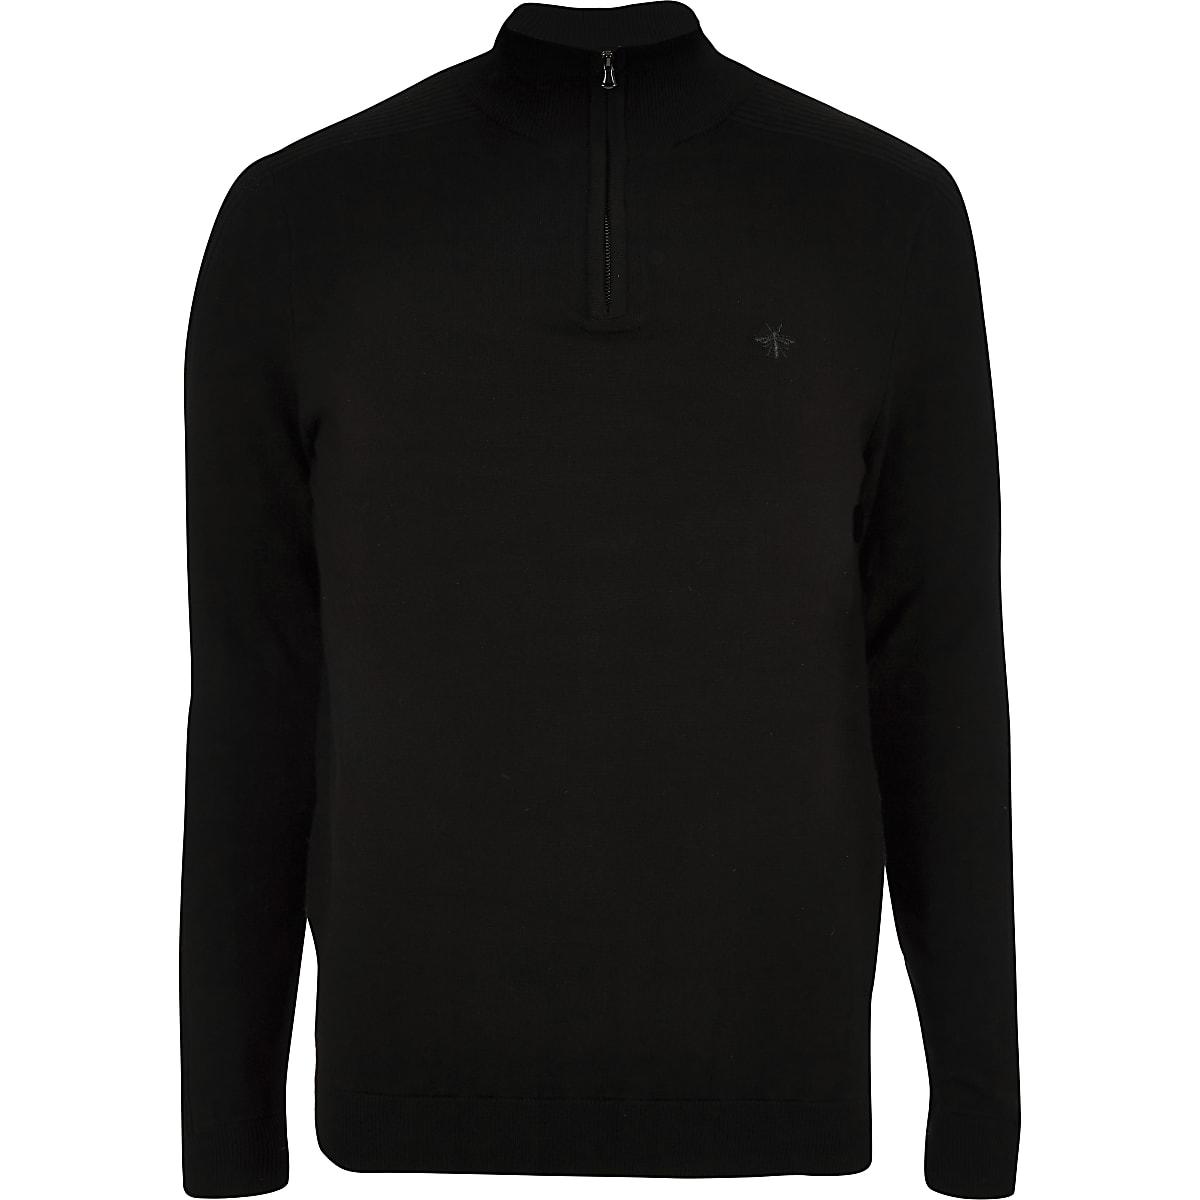 Black zip-up slim fit funnel neck sweater